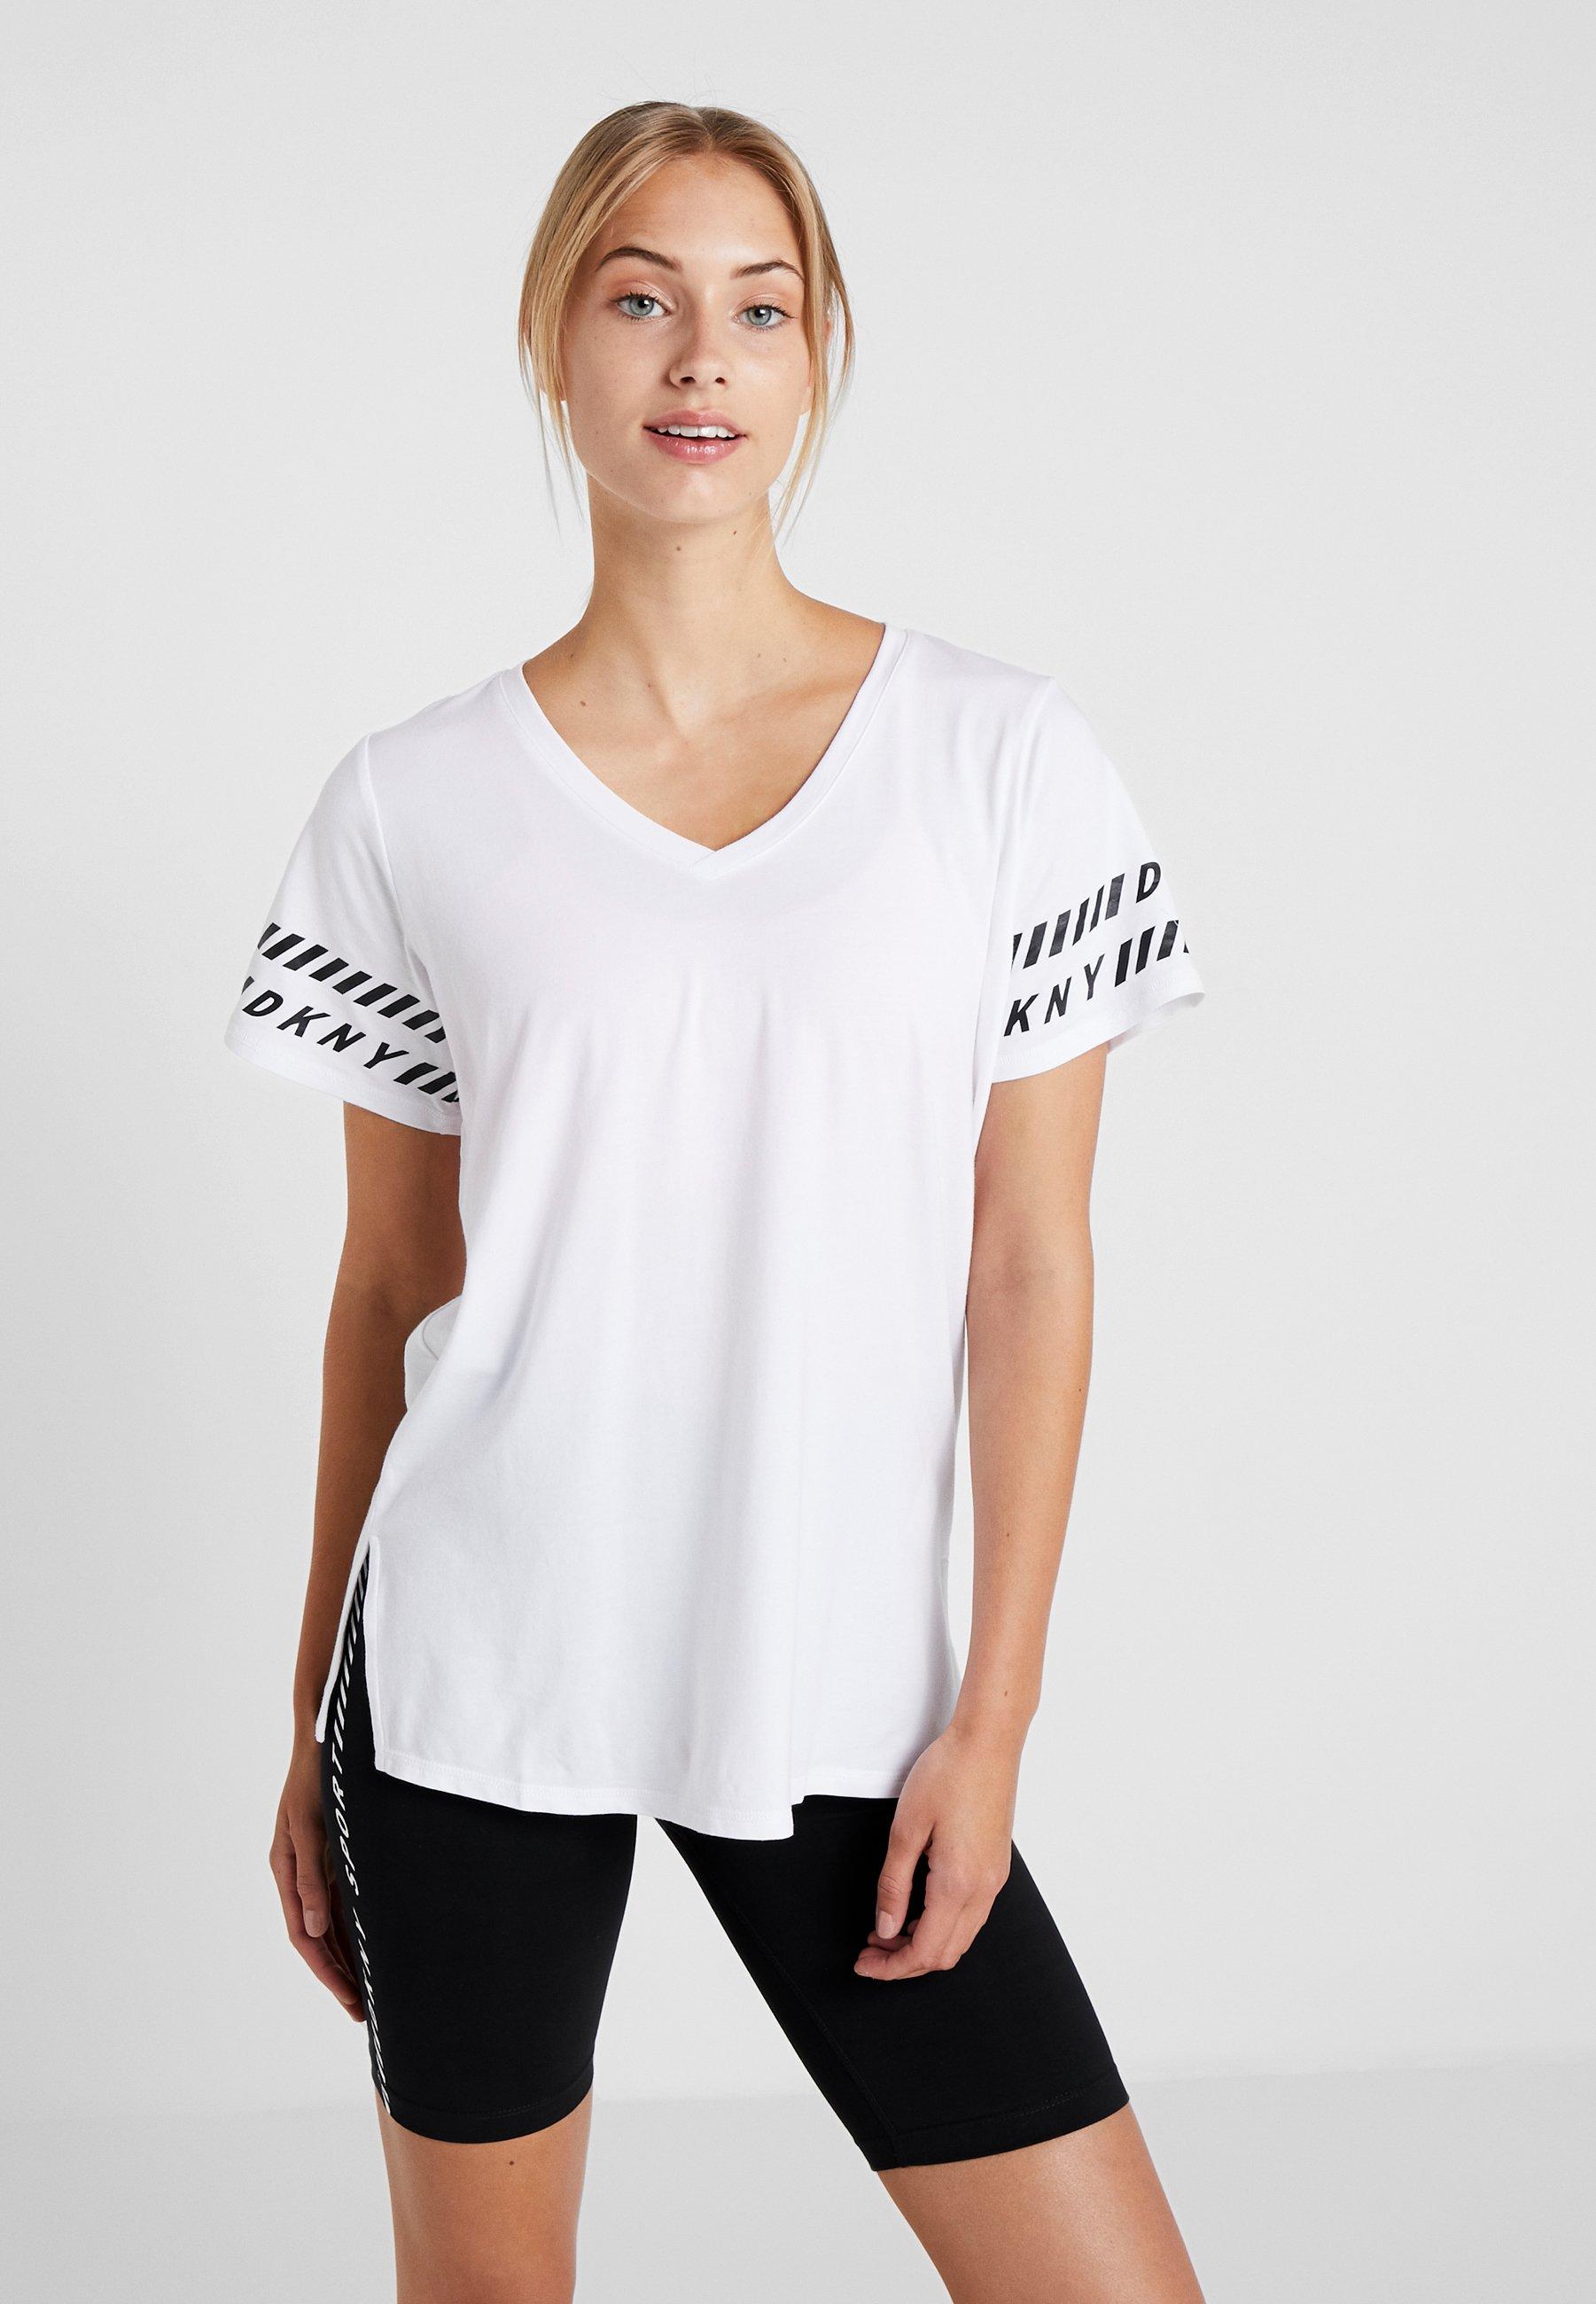 neck White shirt V Dkny TeeT Imprimé 3A54jLRq